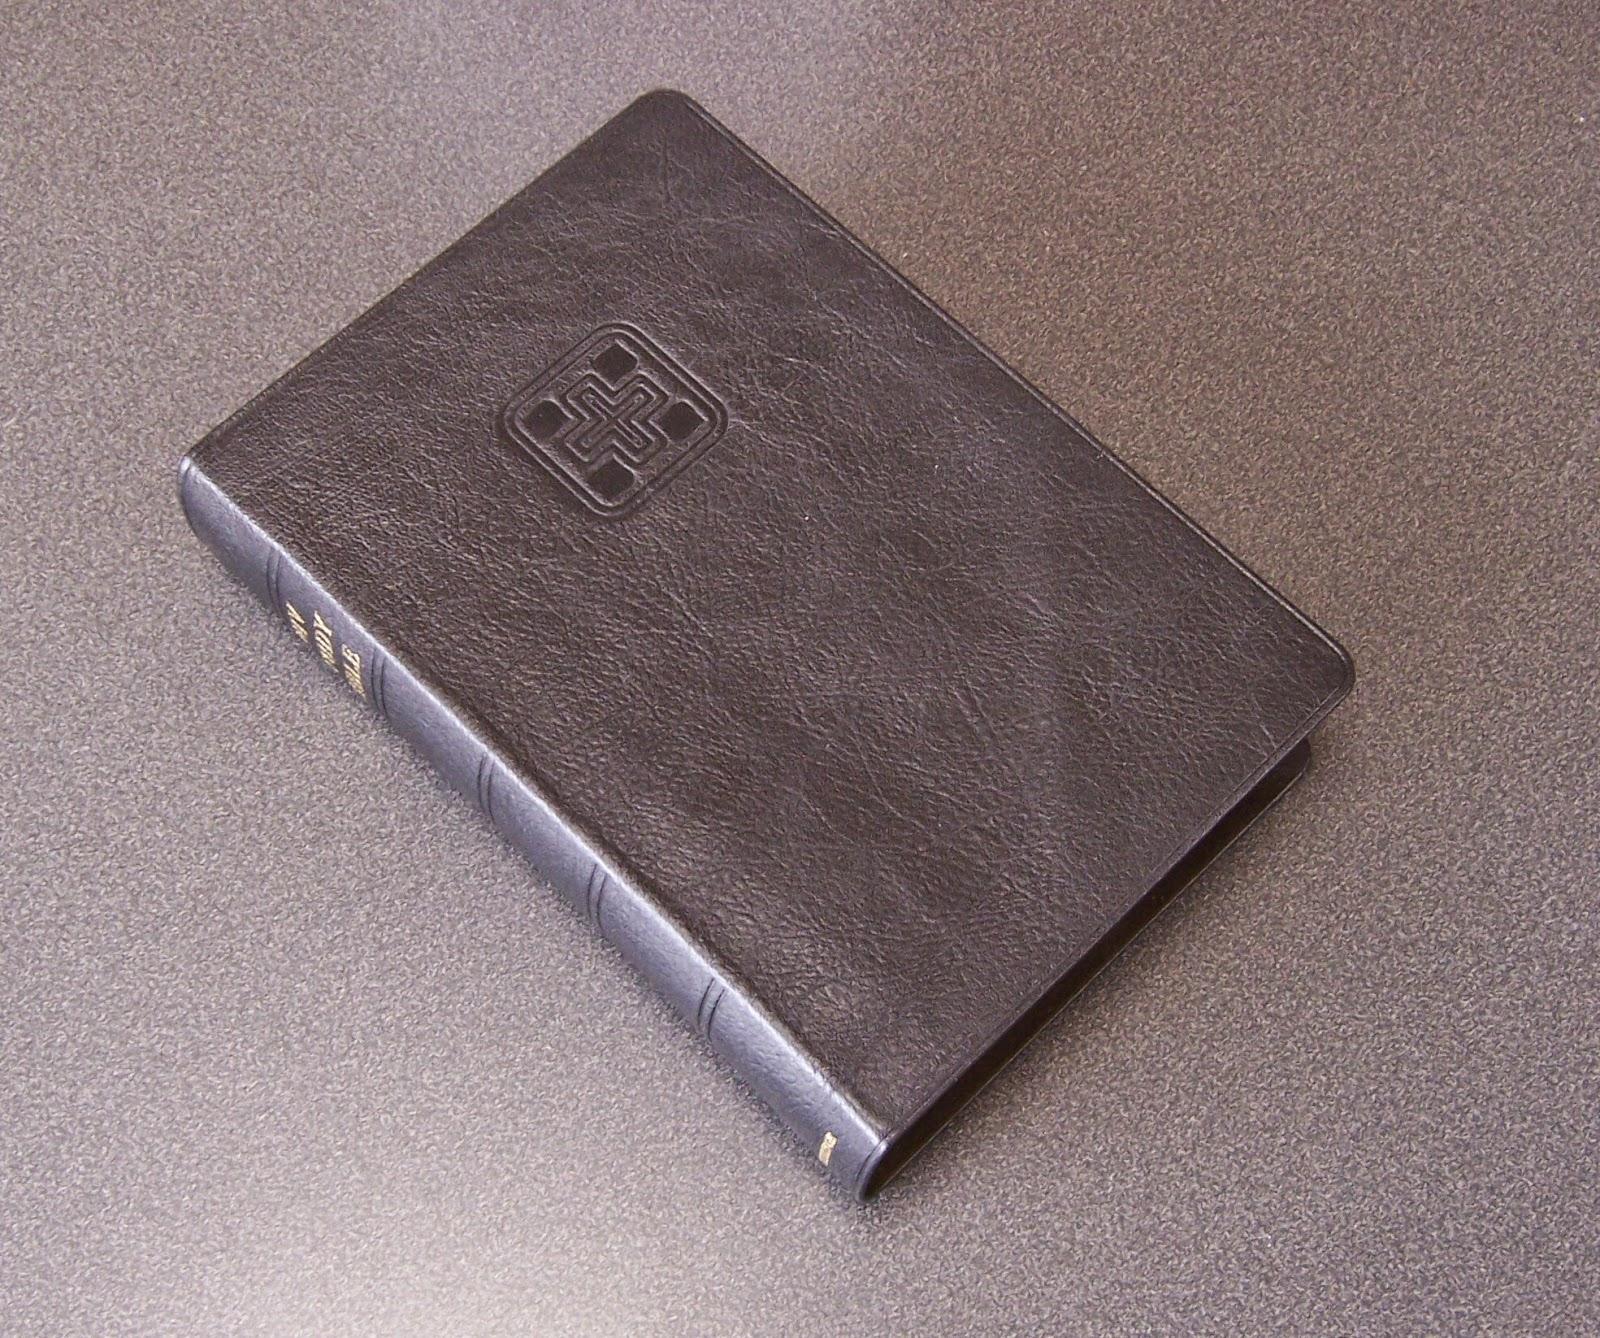 Biblia Sacra Design Niv 1984 Bibles Going Going